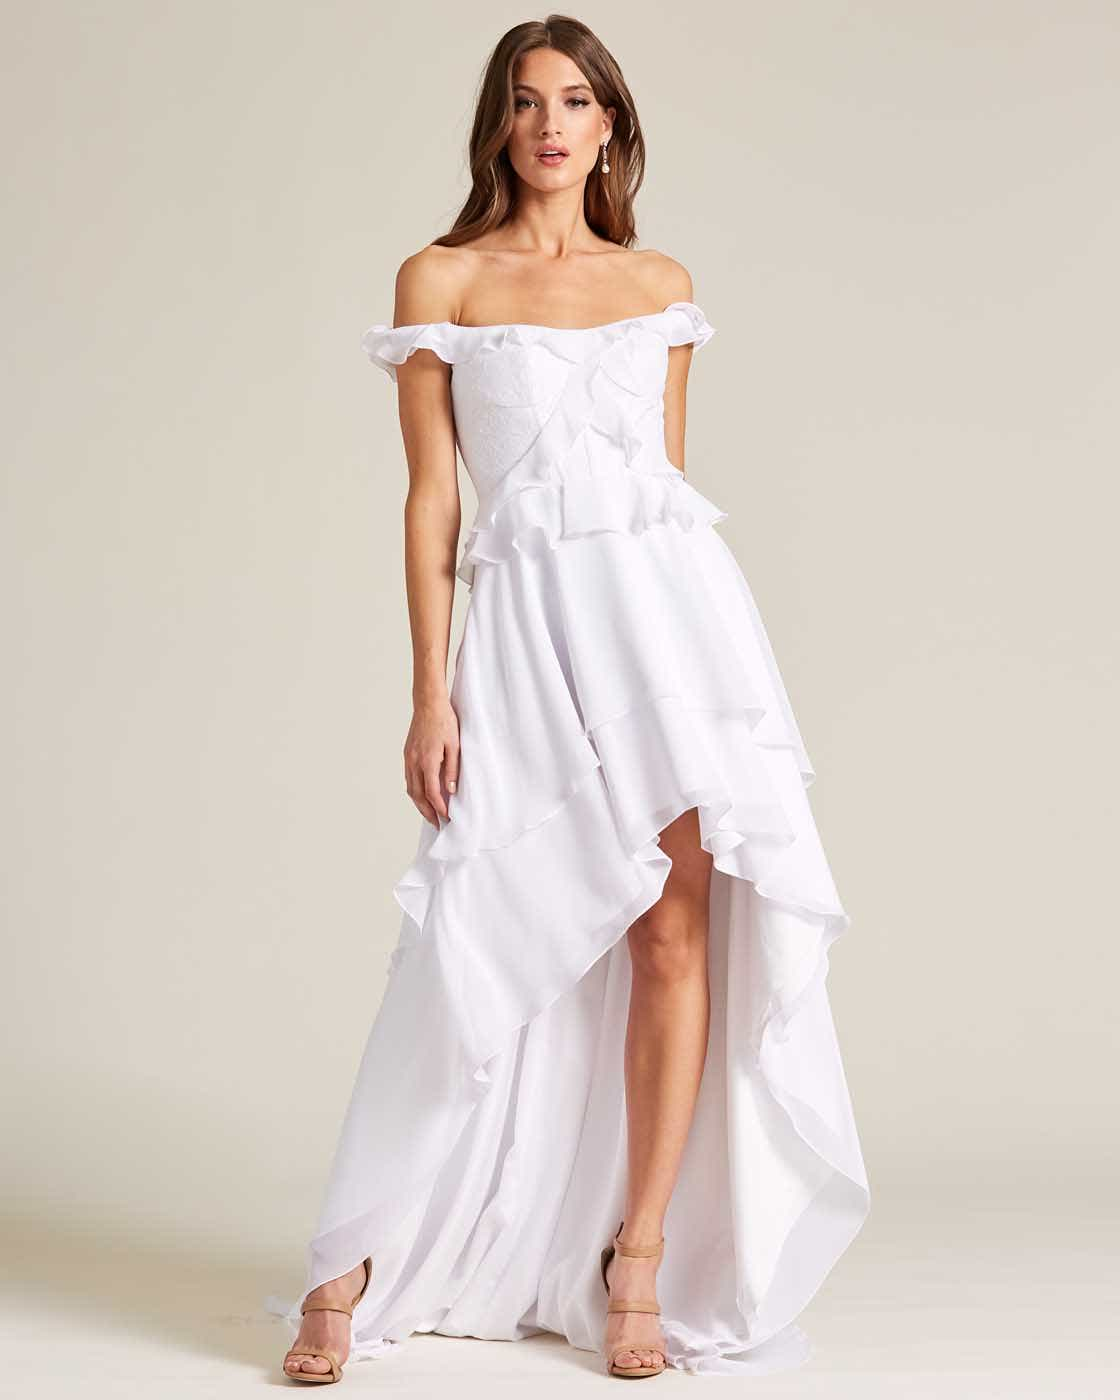 Classic Open Back Ruffle Style Wedding Dress - Front